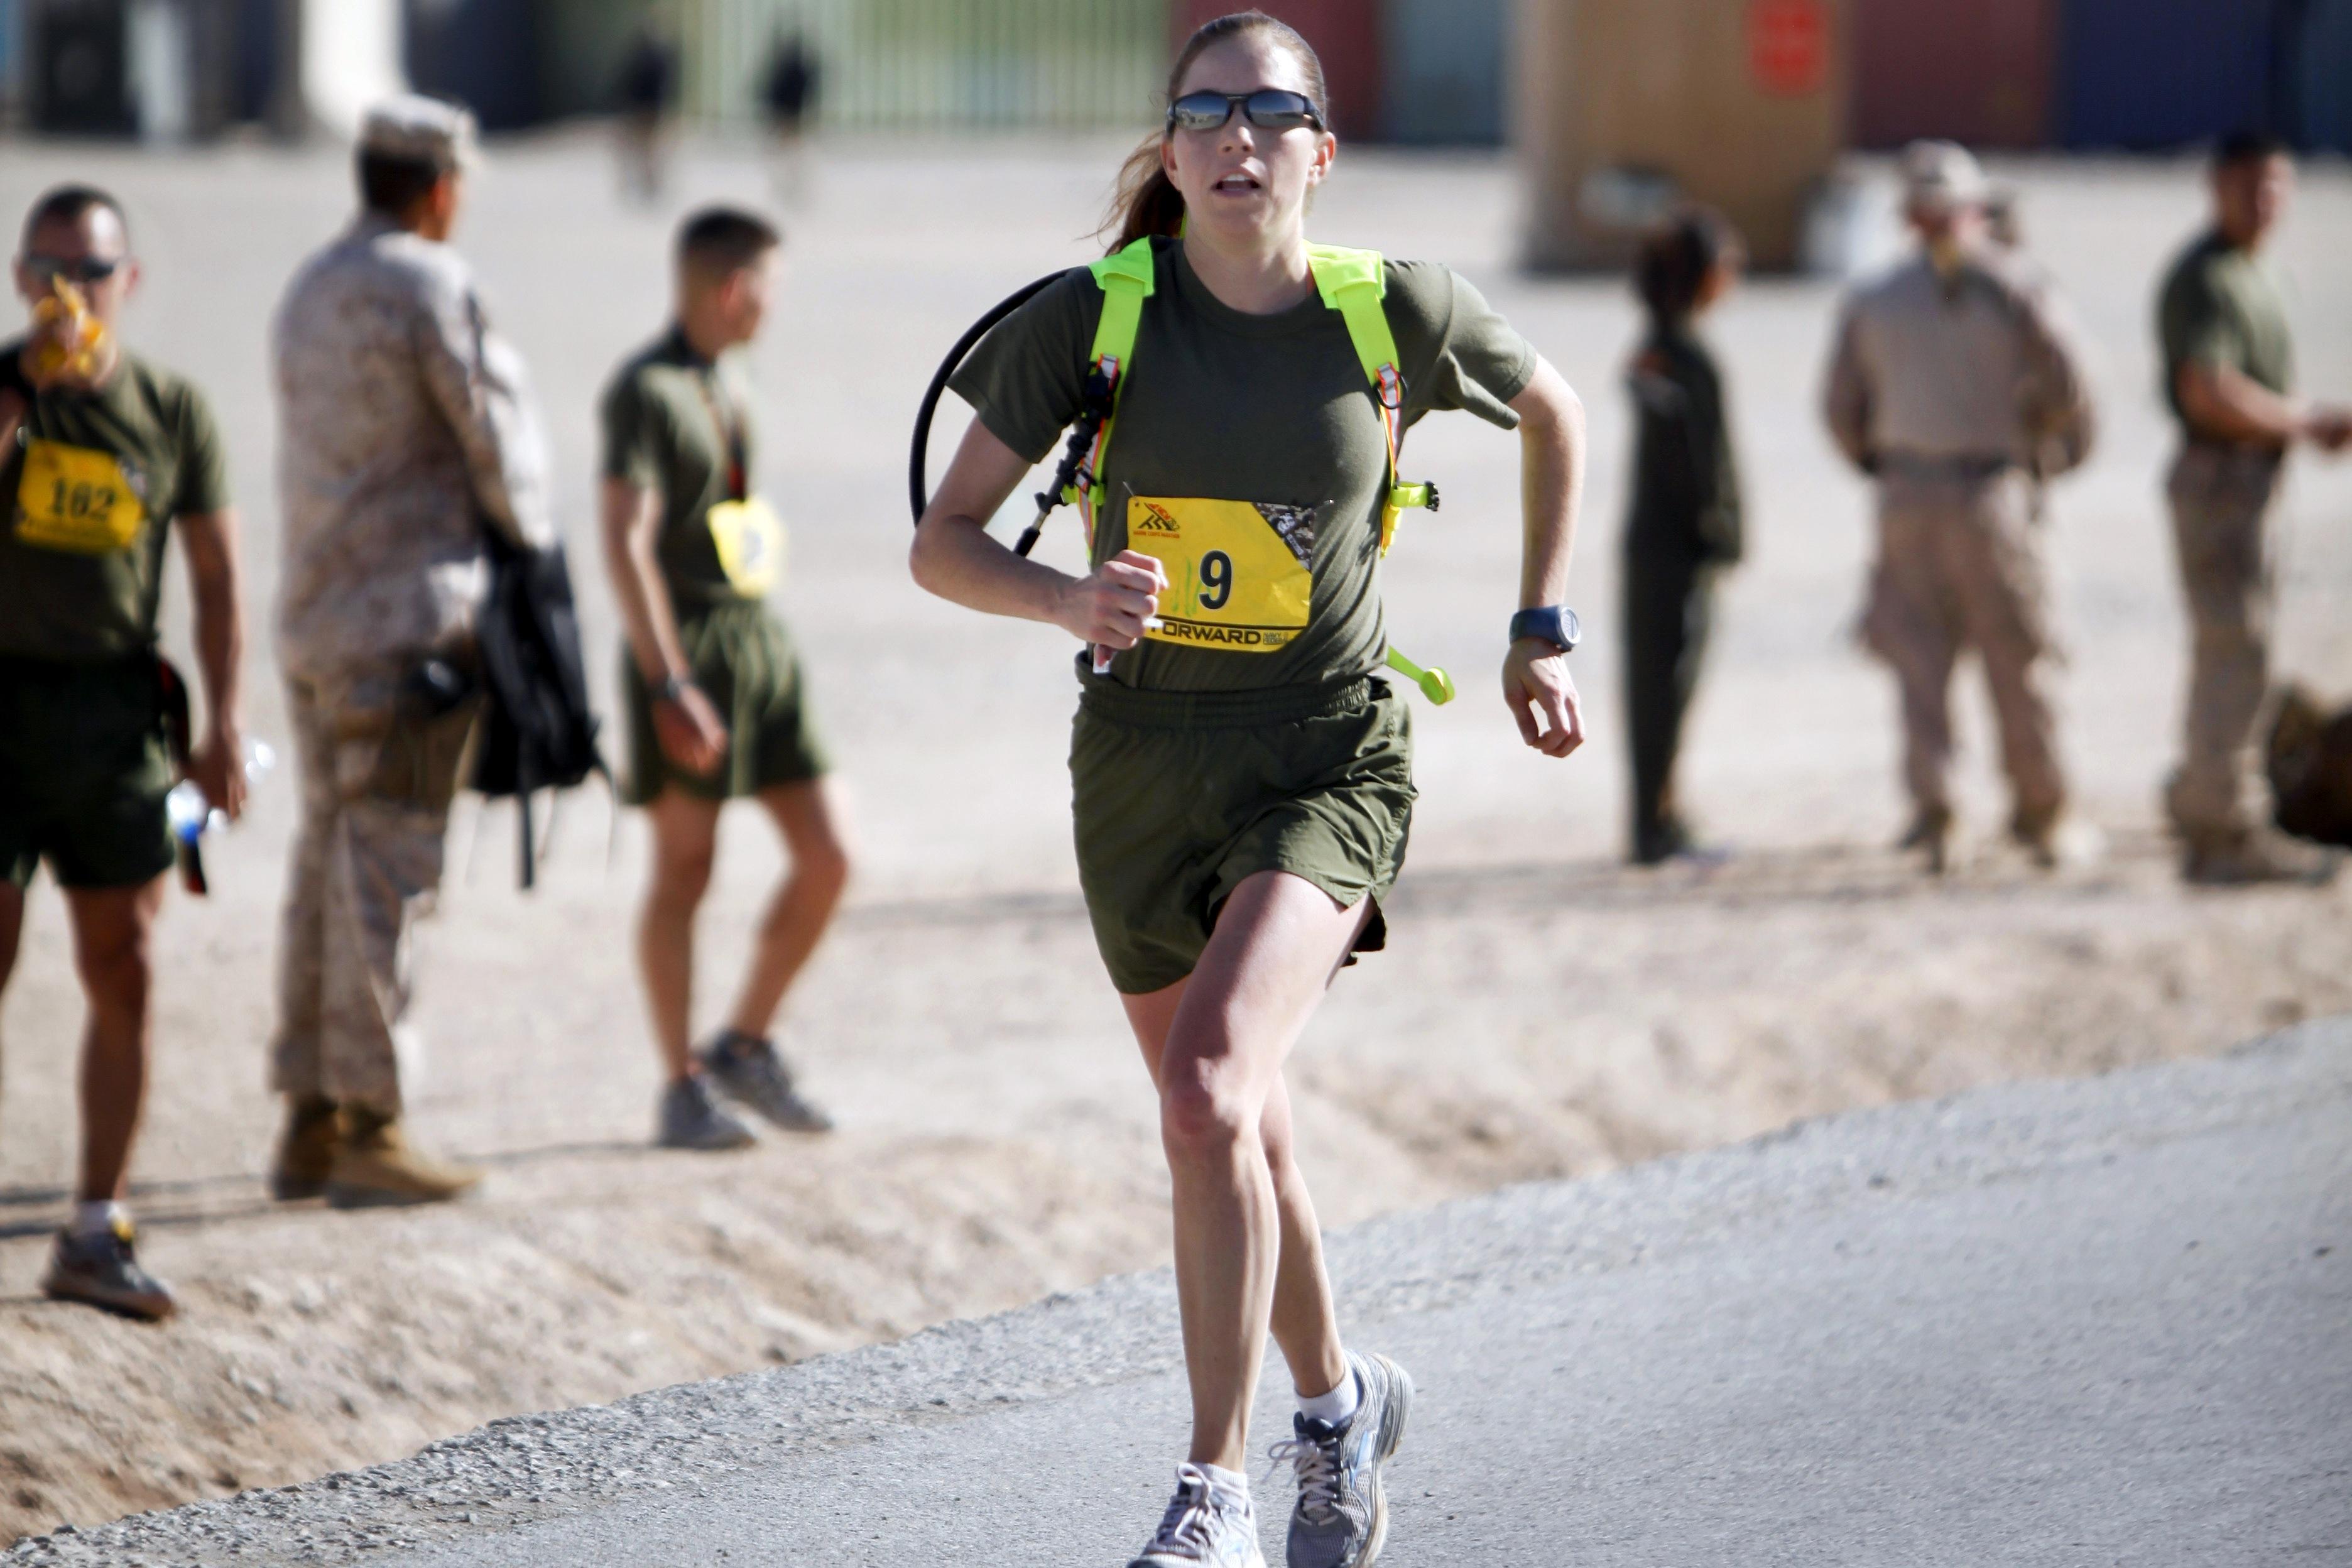 Marathon Runner, Runner, Running, Marathon, Woman, HQ Photo